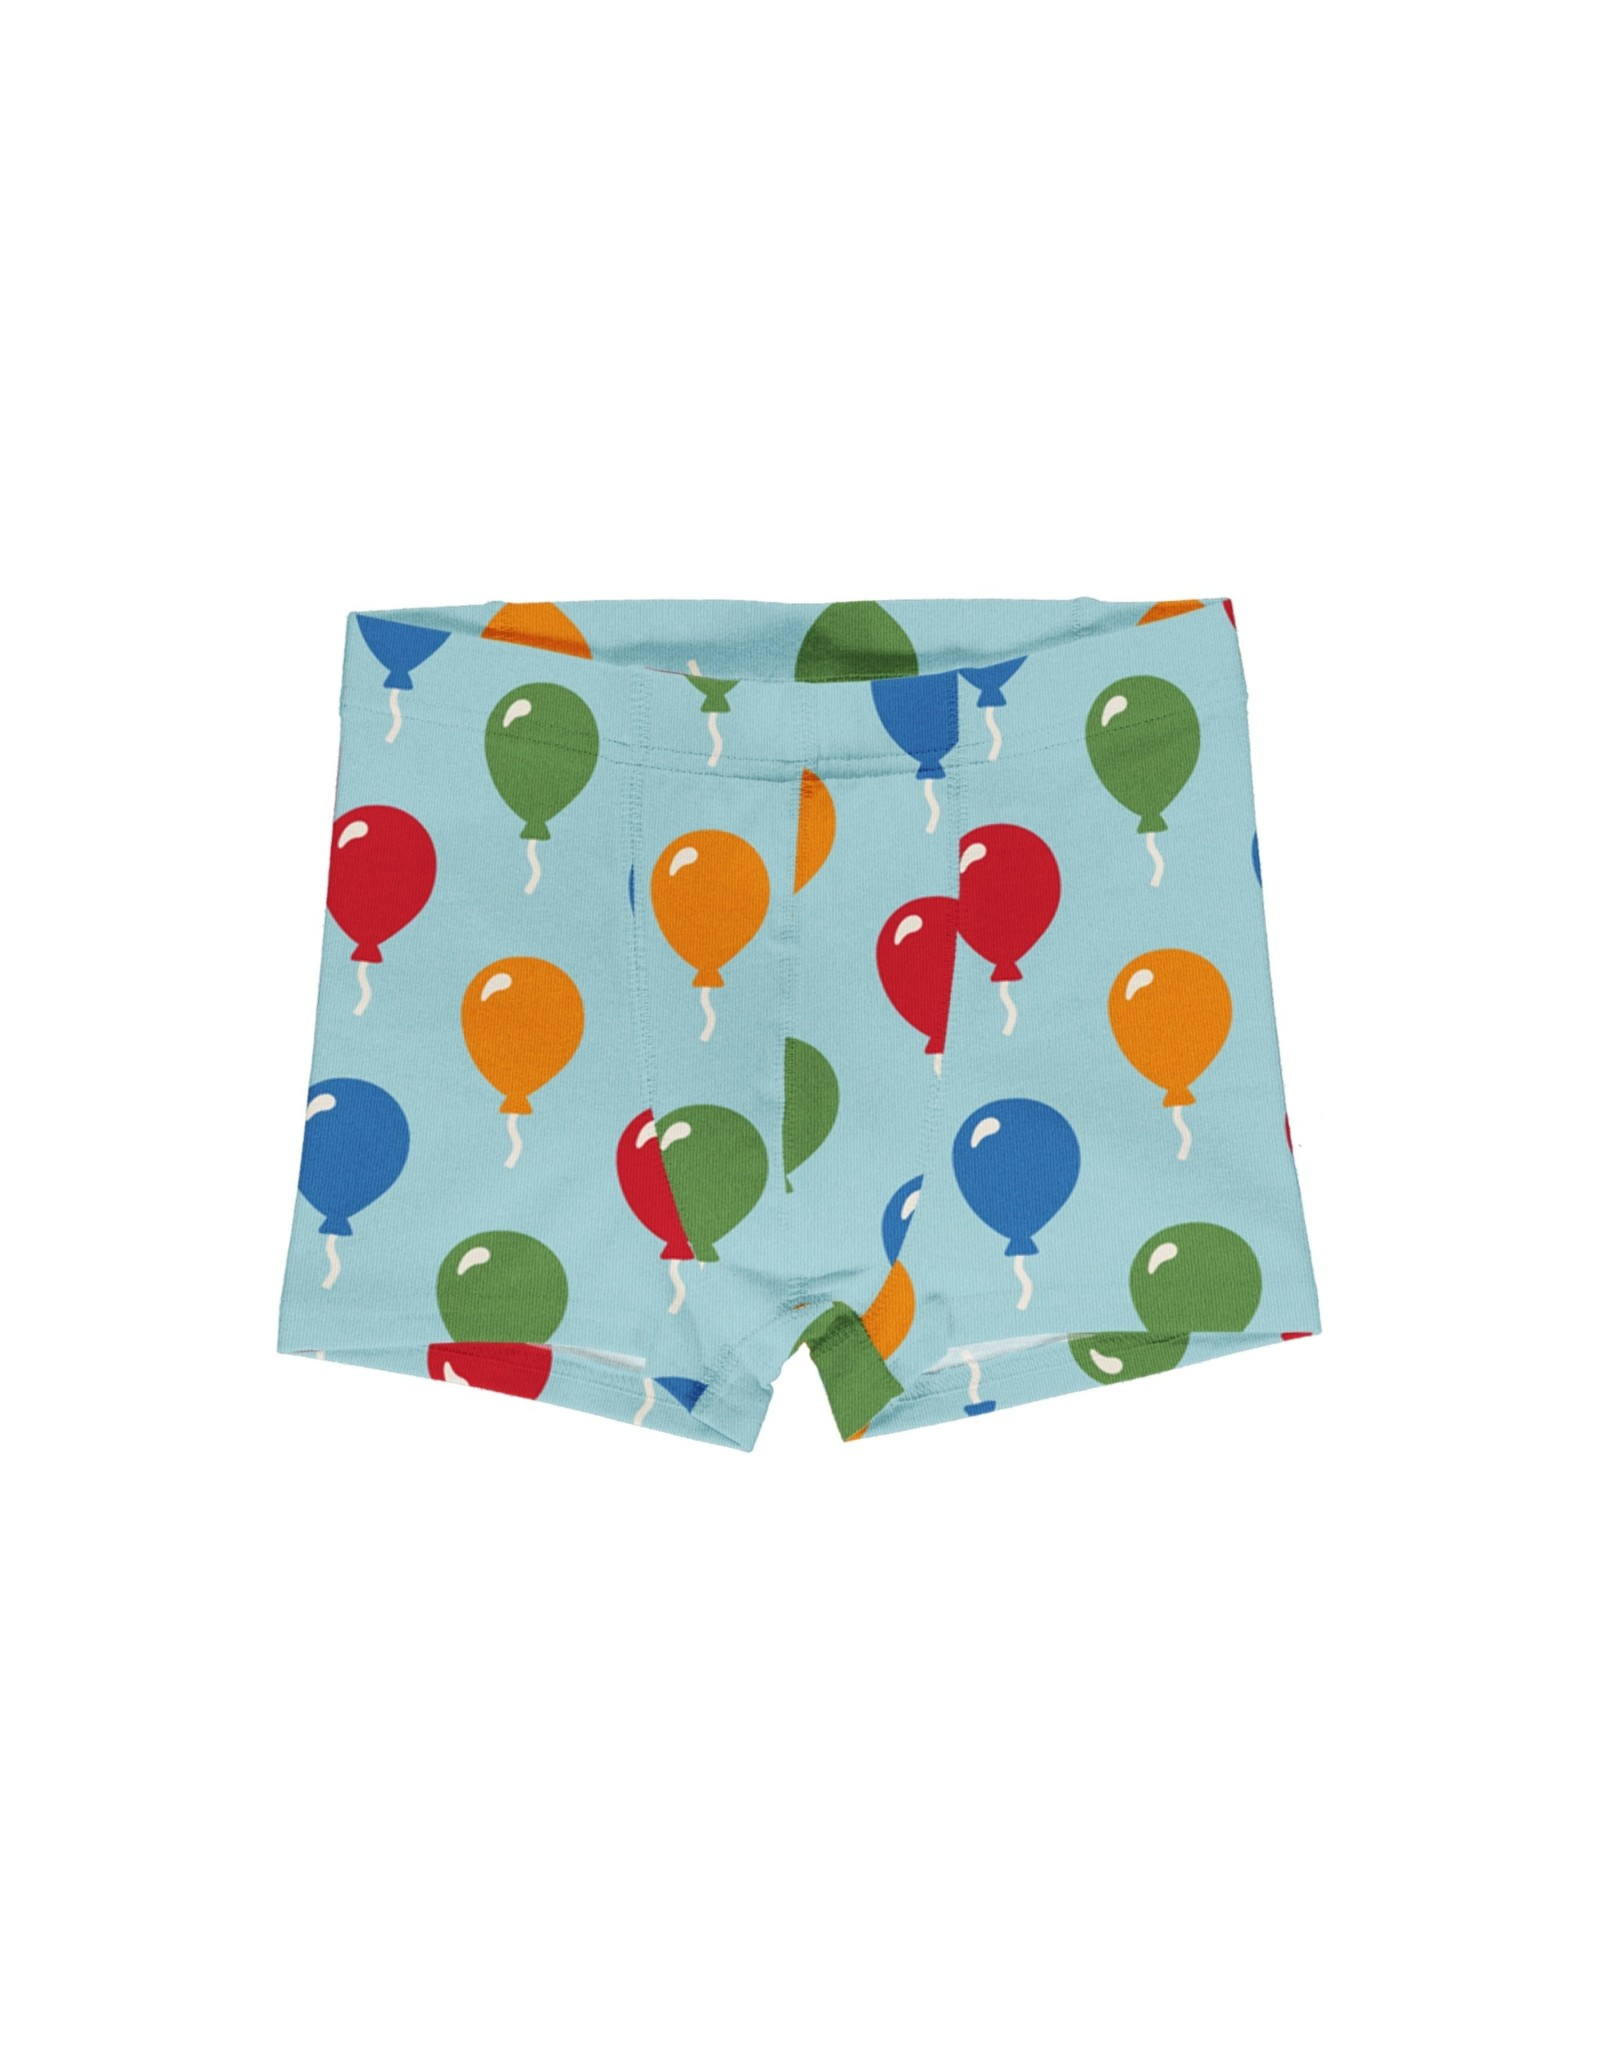 Maxomorra Boxer Short met ballonnen print